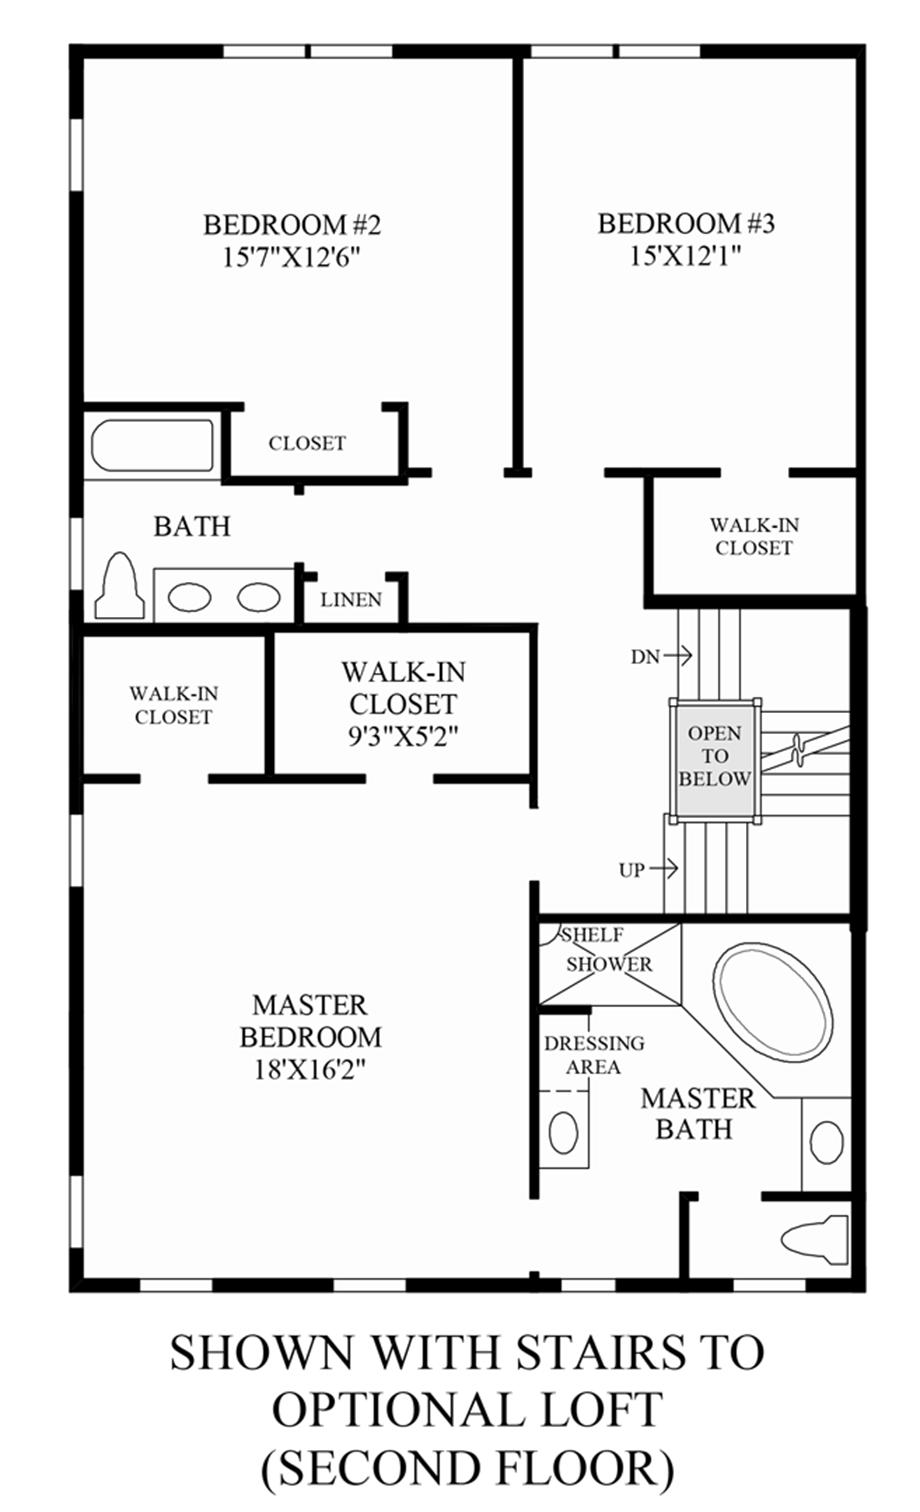 Stairs to Optional Loft (2nd Floor) Floor Plan